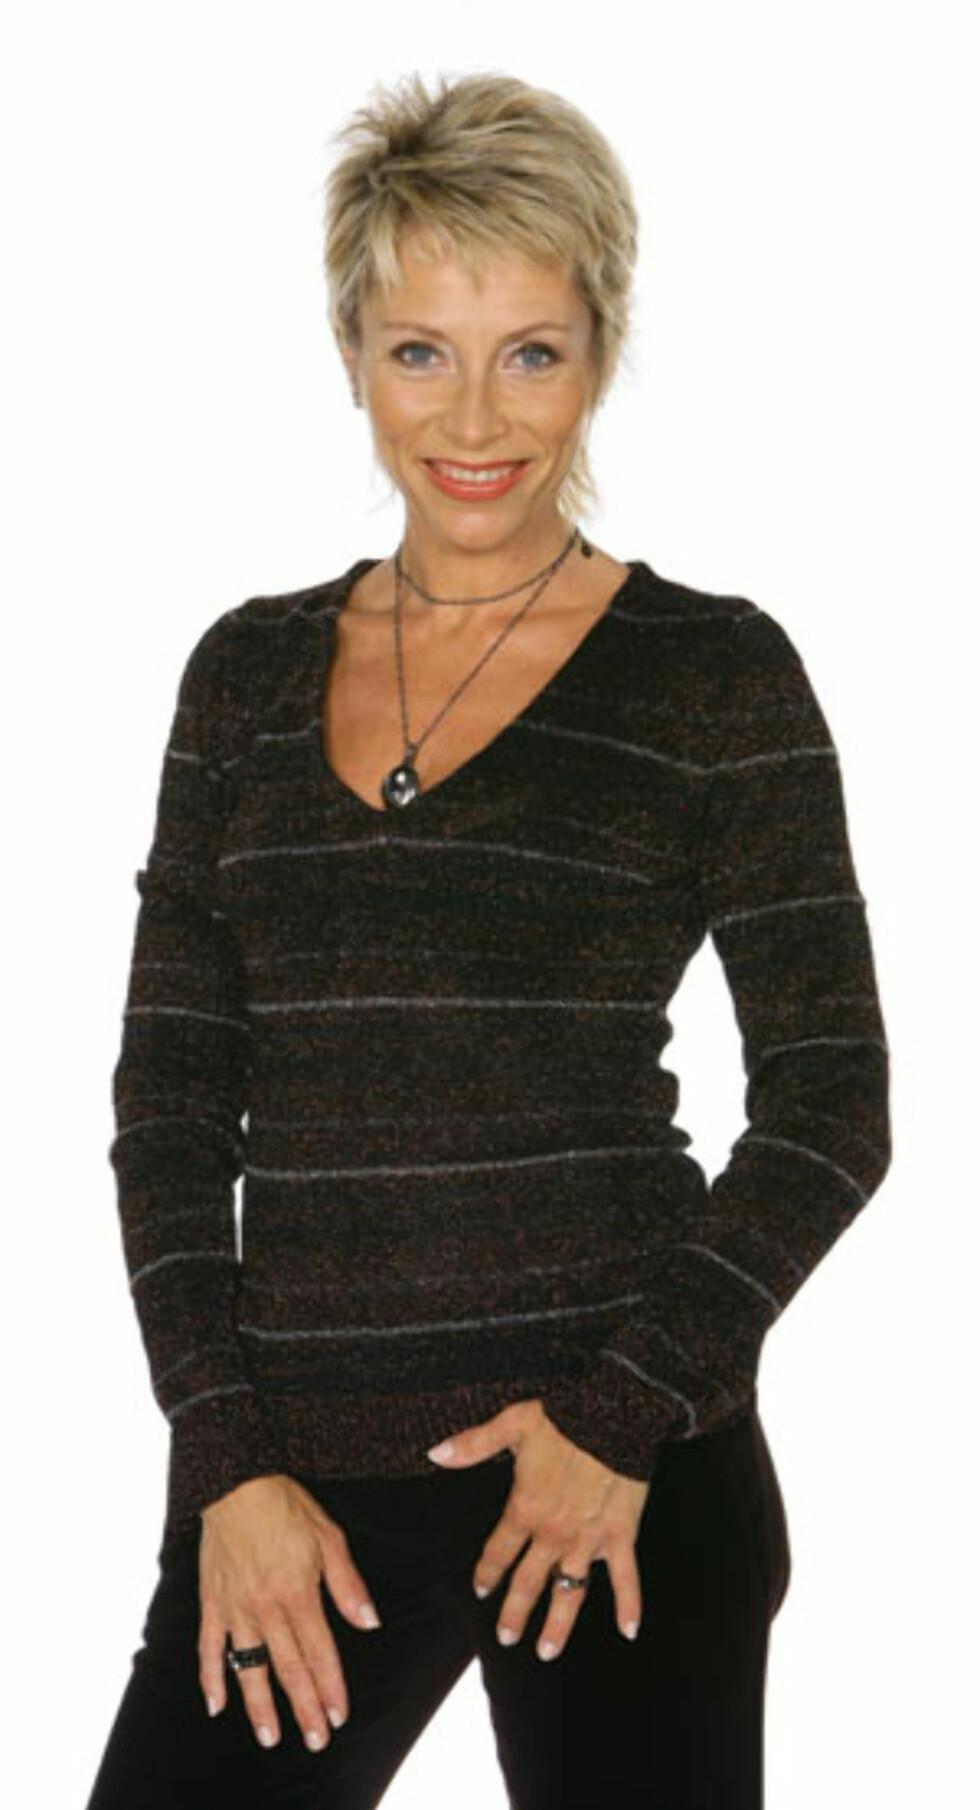 Sjefredaktør Bente E. Engesland